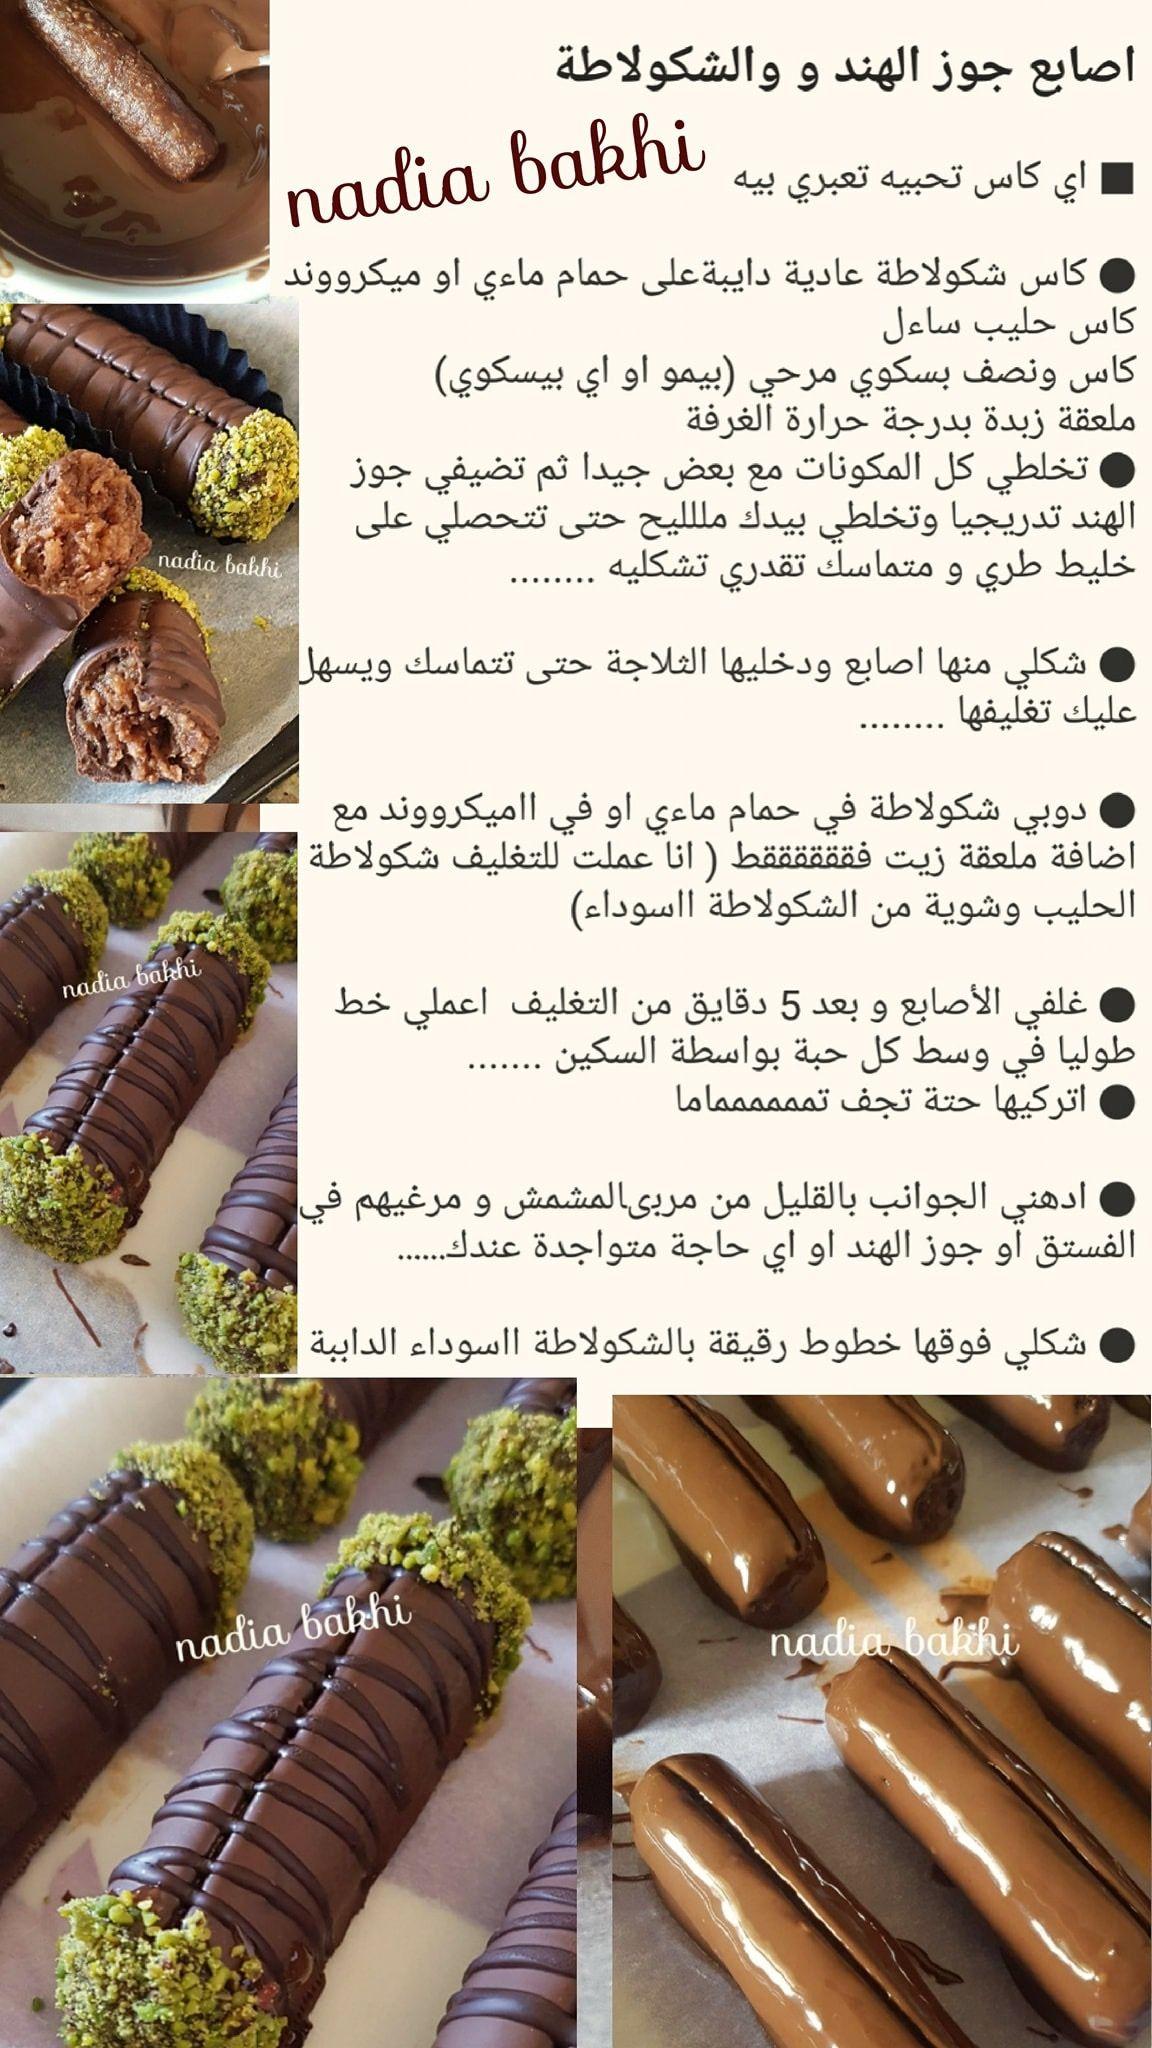 Pin By Jakboub Bavary On Nadia Bakhi Recettes Arabic Sweets Recipes Save Food Dessert Recipes